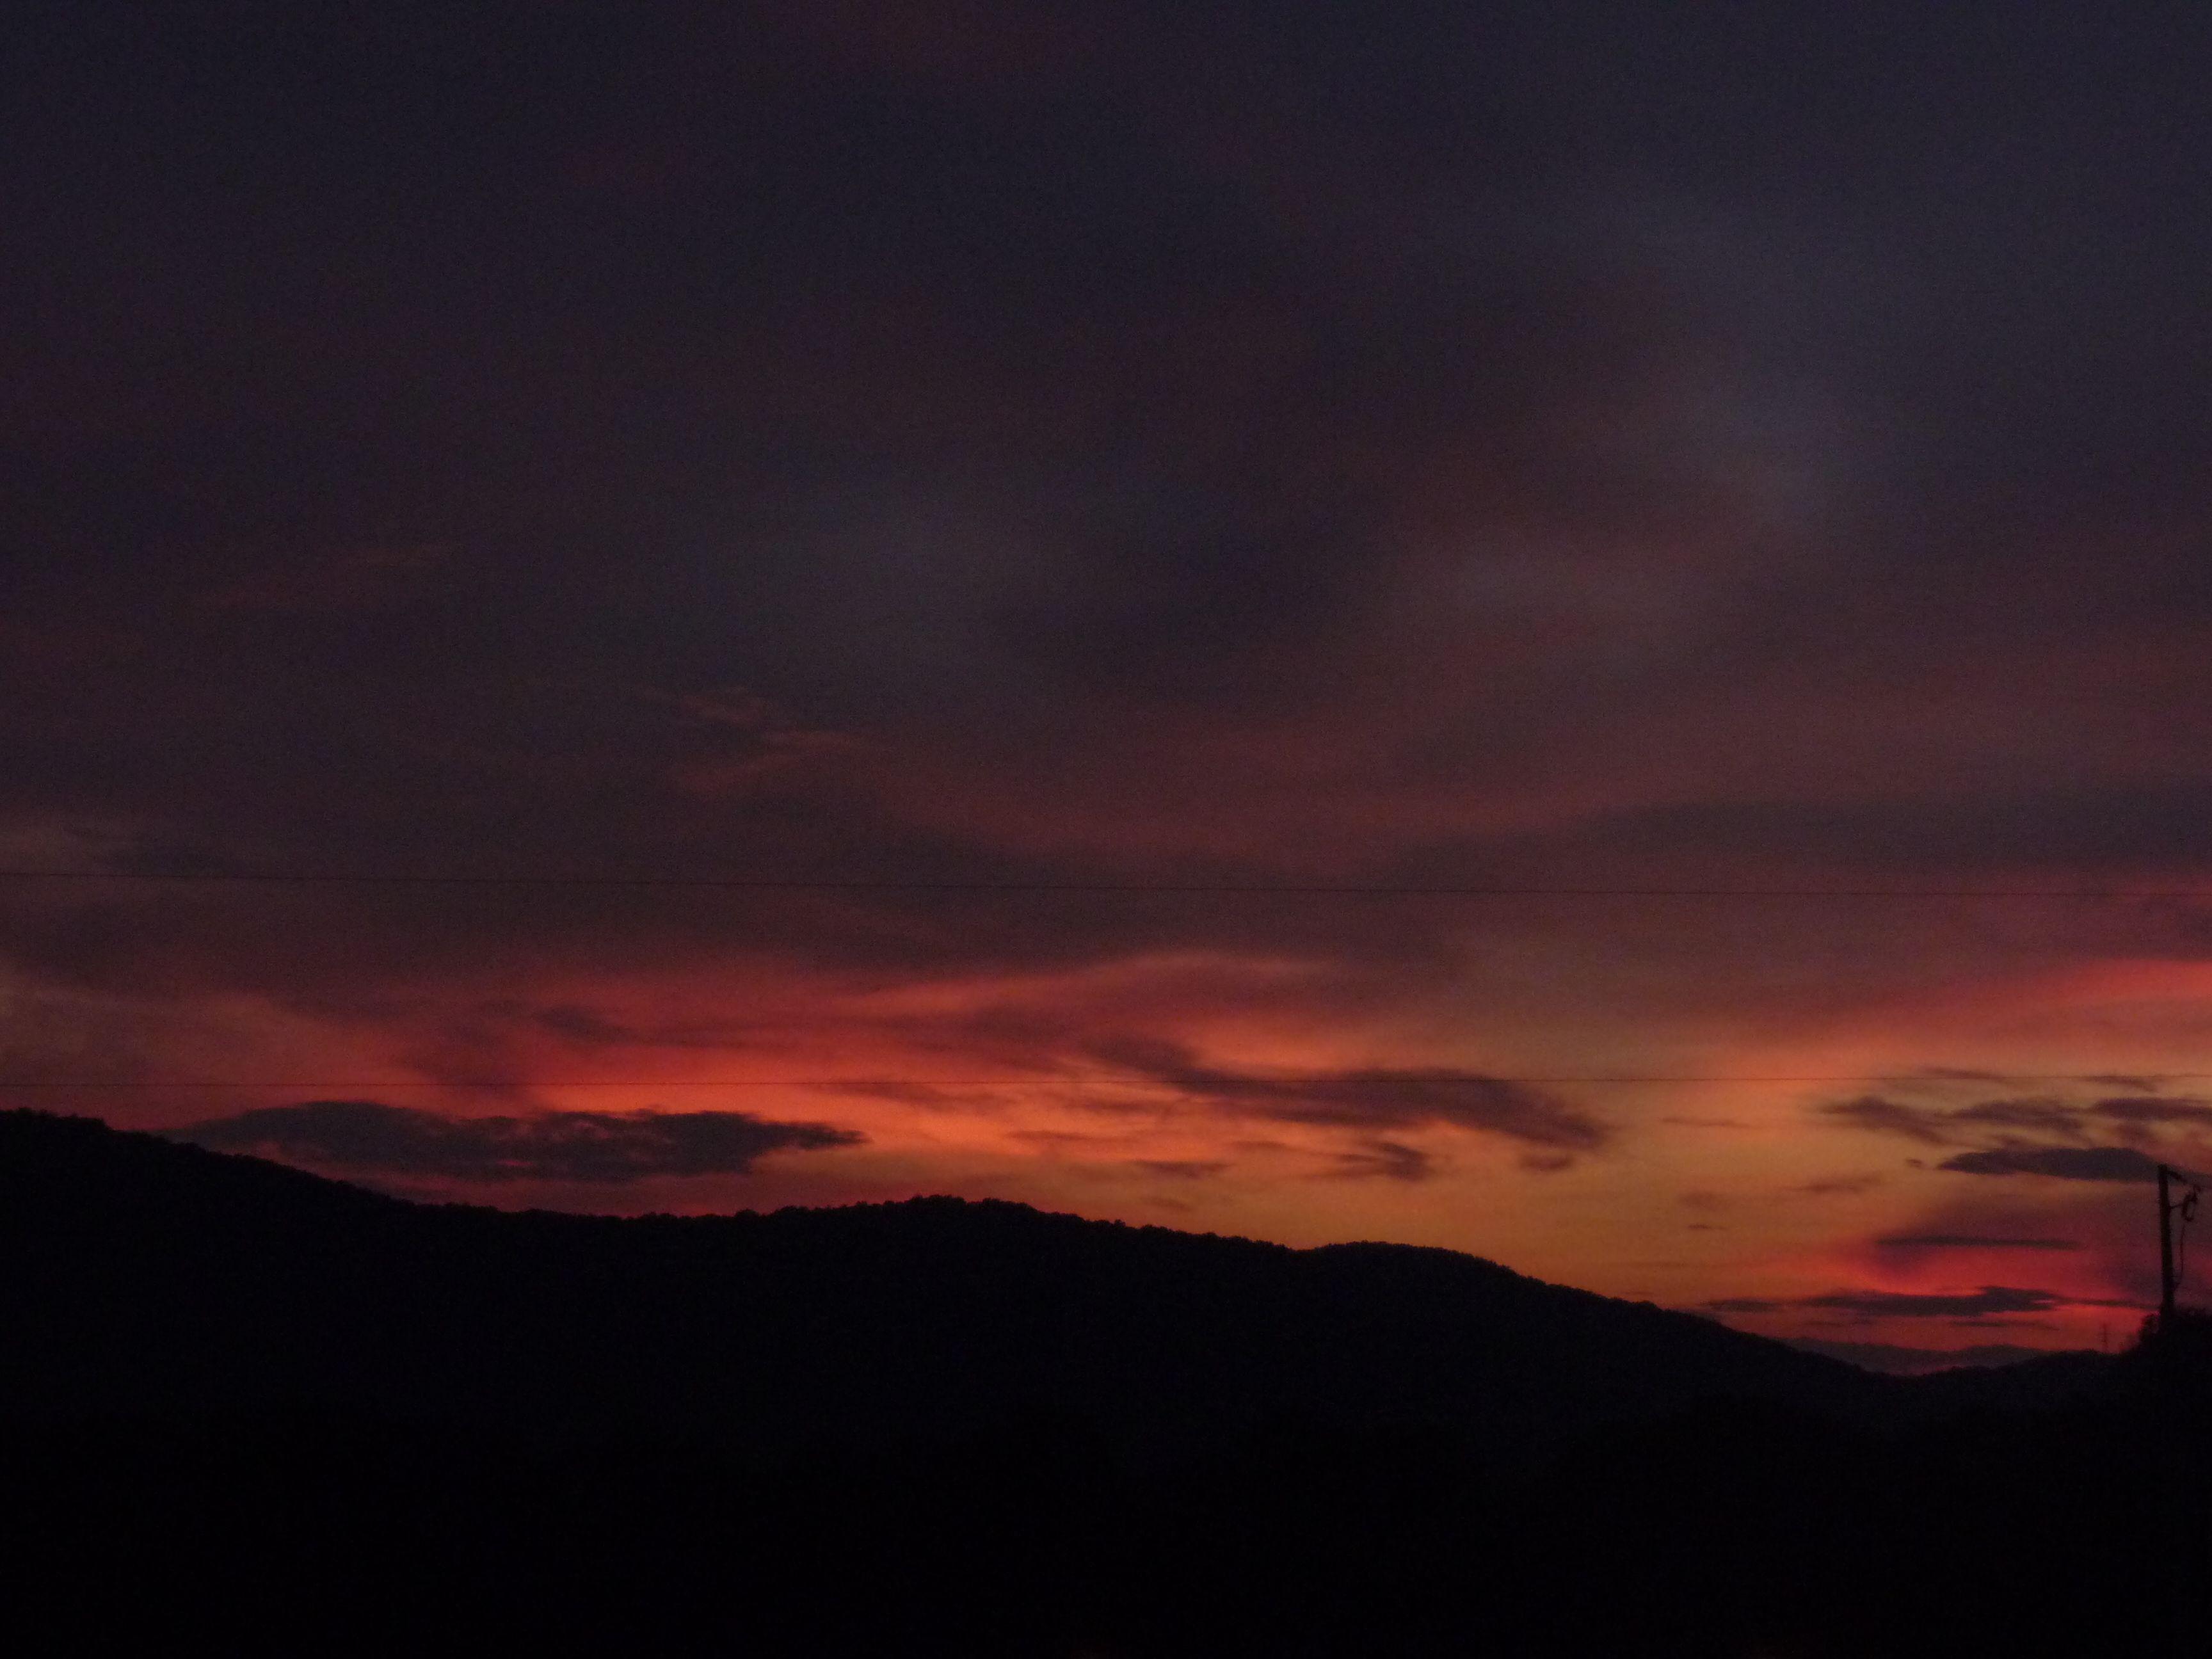 Sunset July 4th 2011, Huntsville, AL